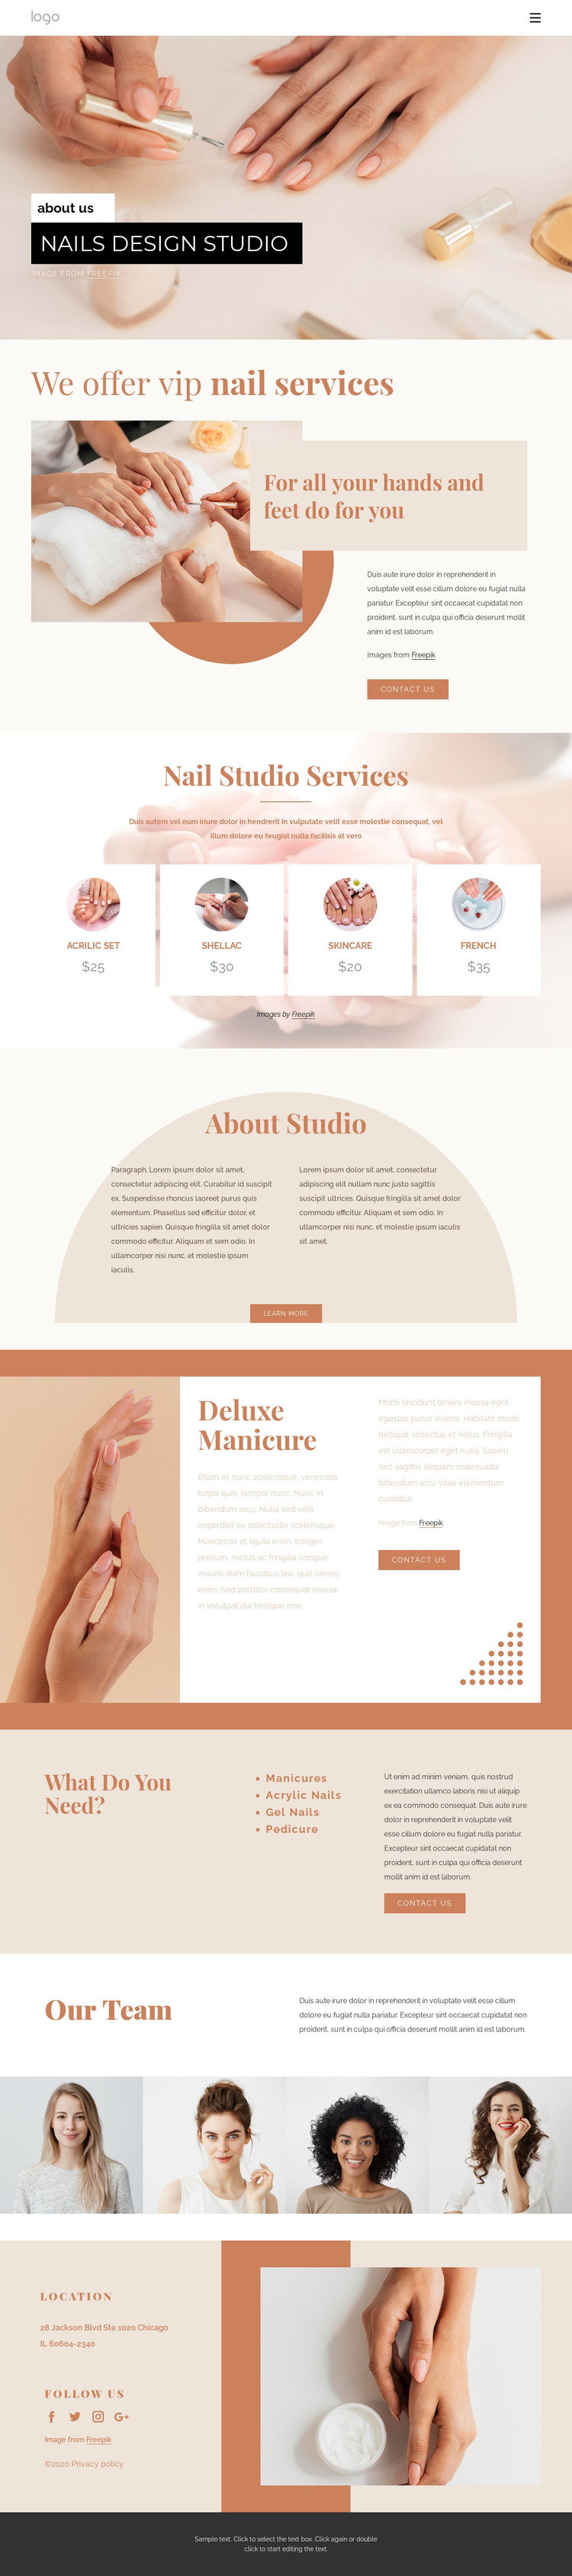 Professional nail art Web Design